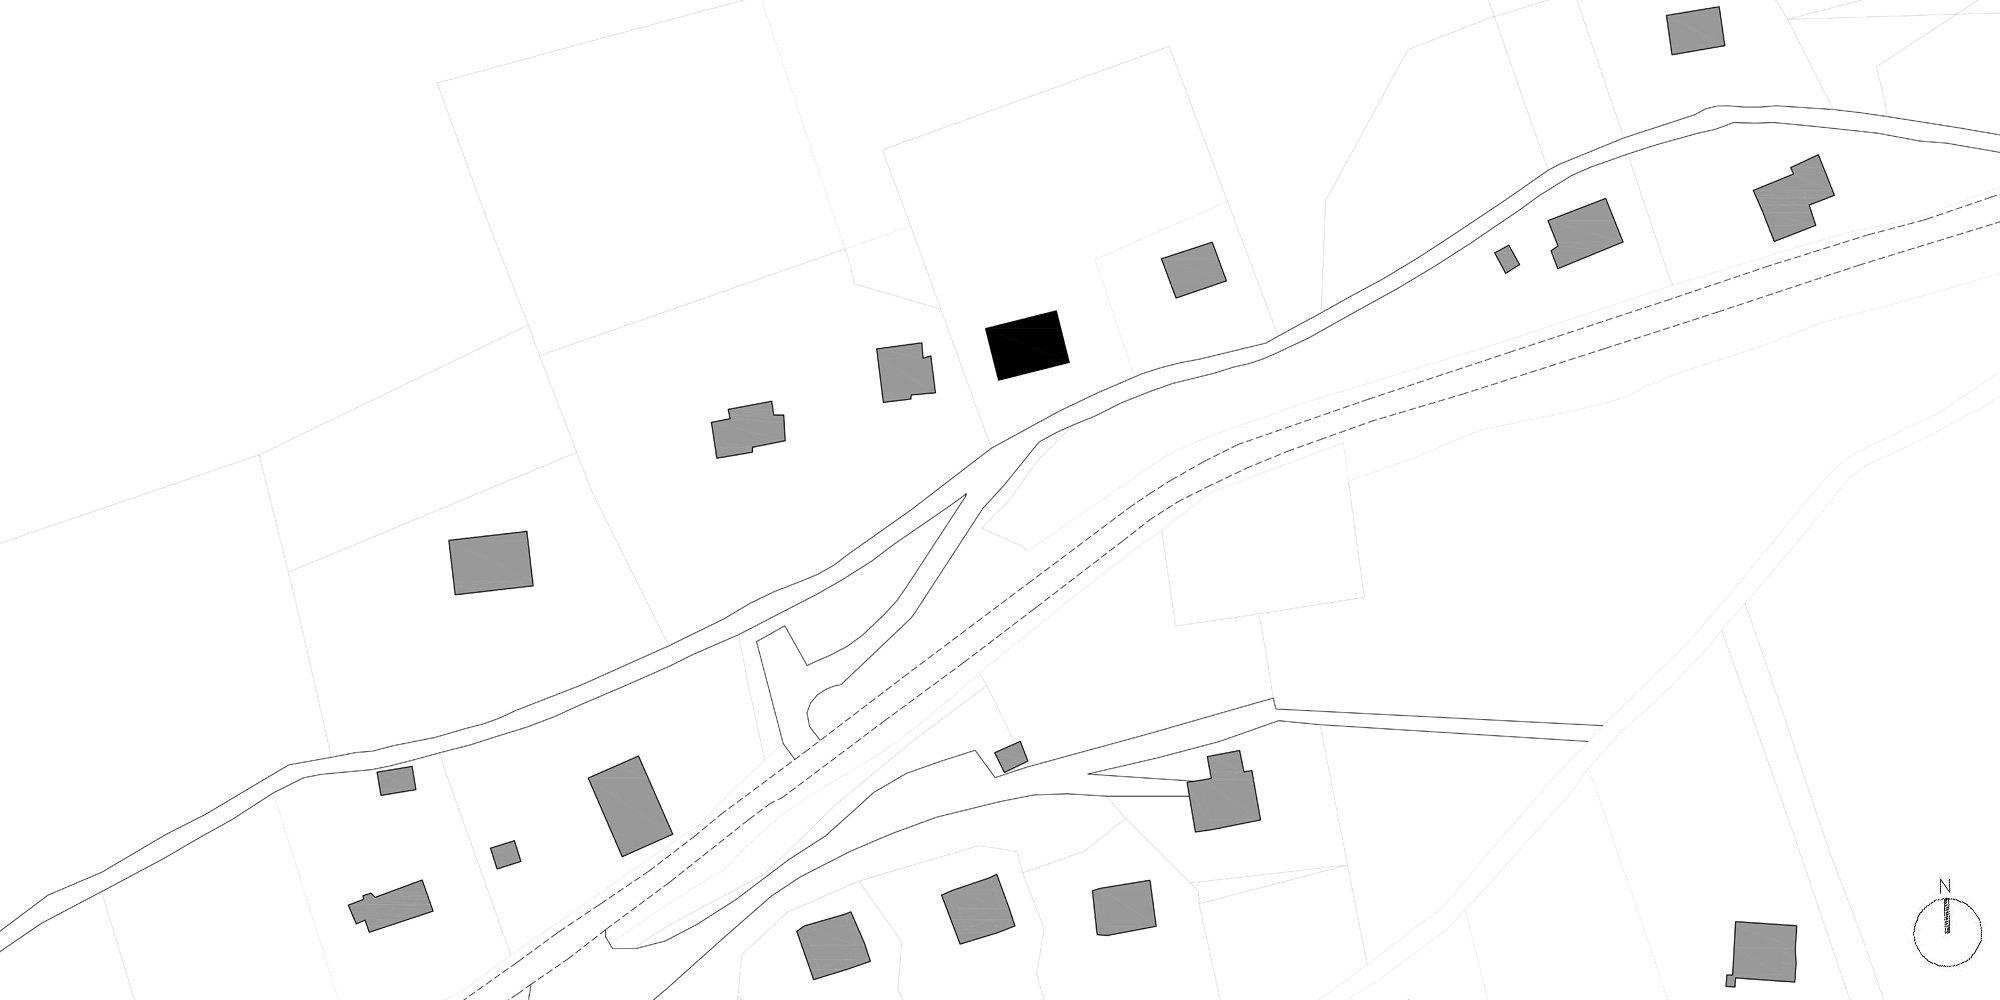 Planimetria © Studio Razavi Architecture